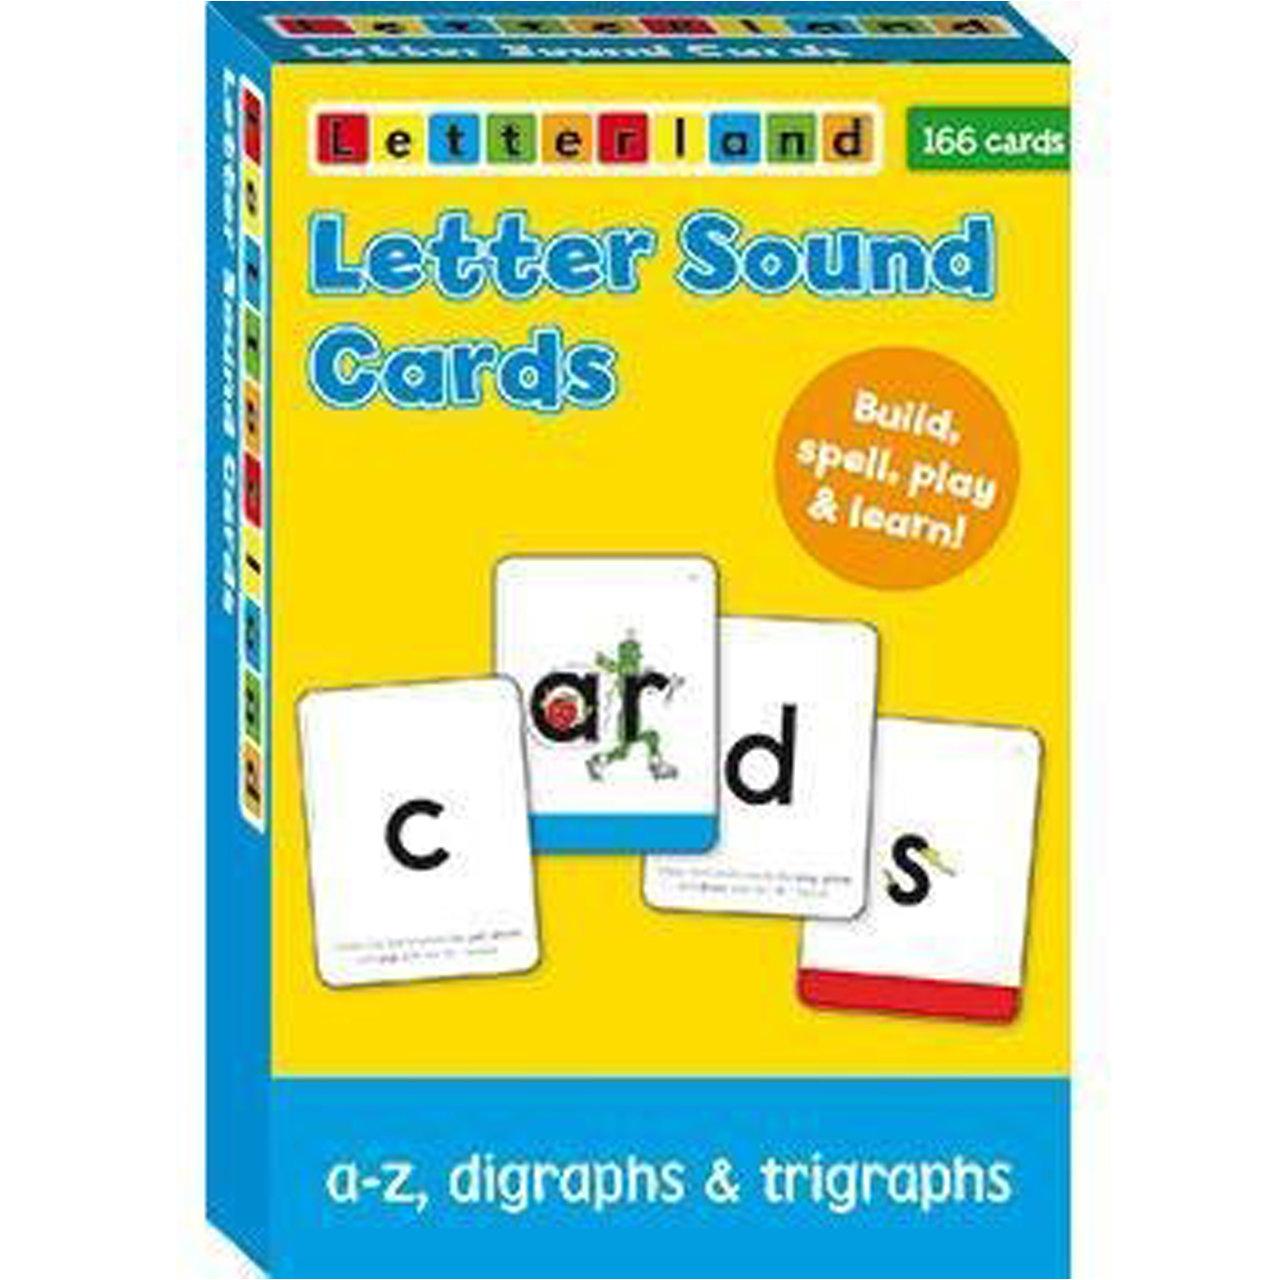 Letter Sound Cards